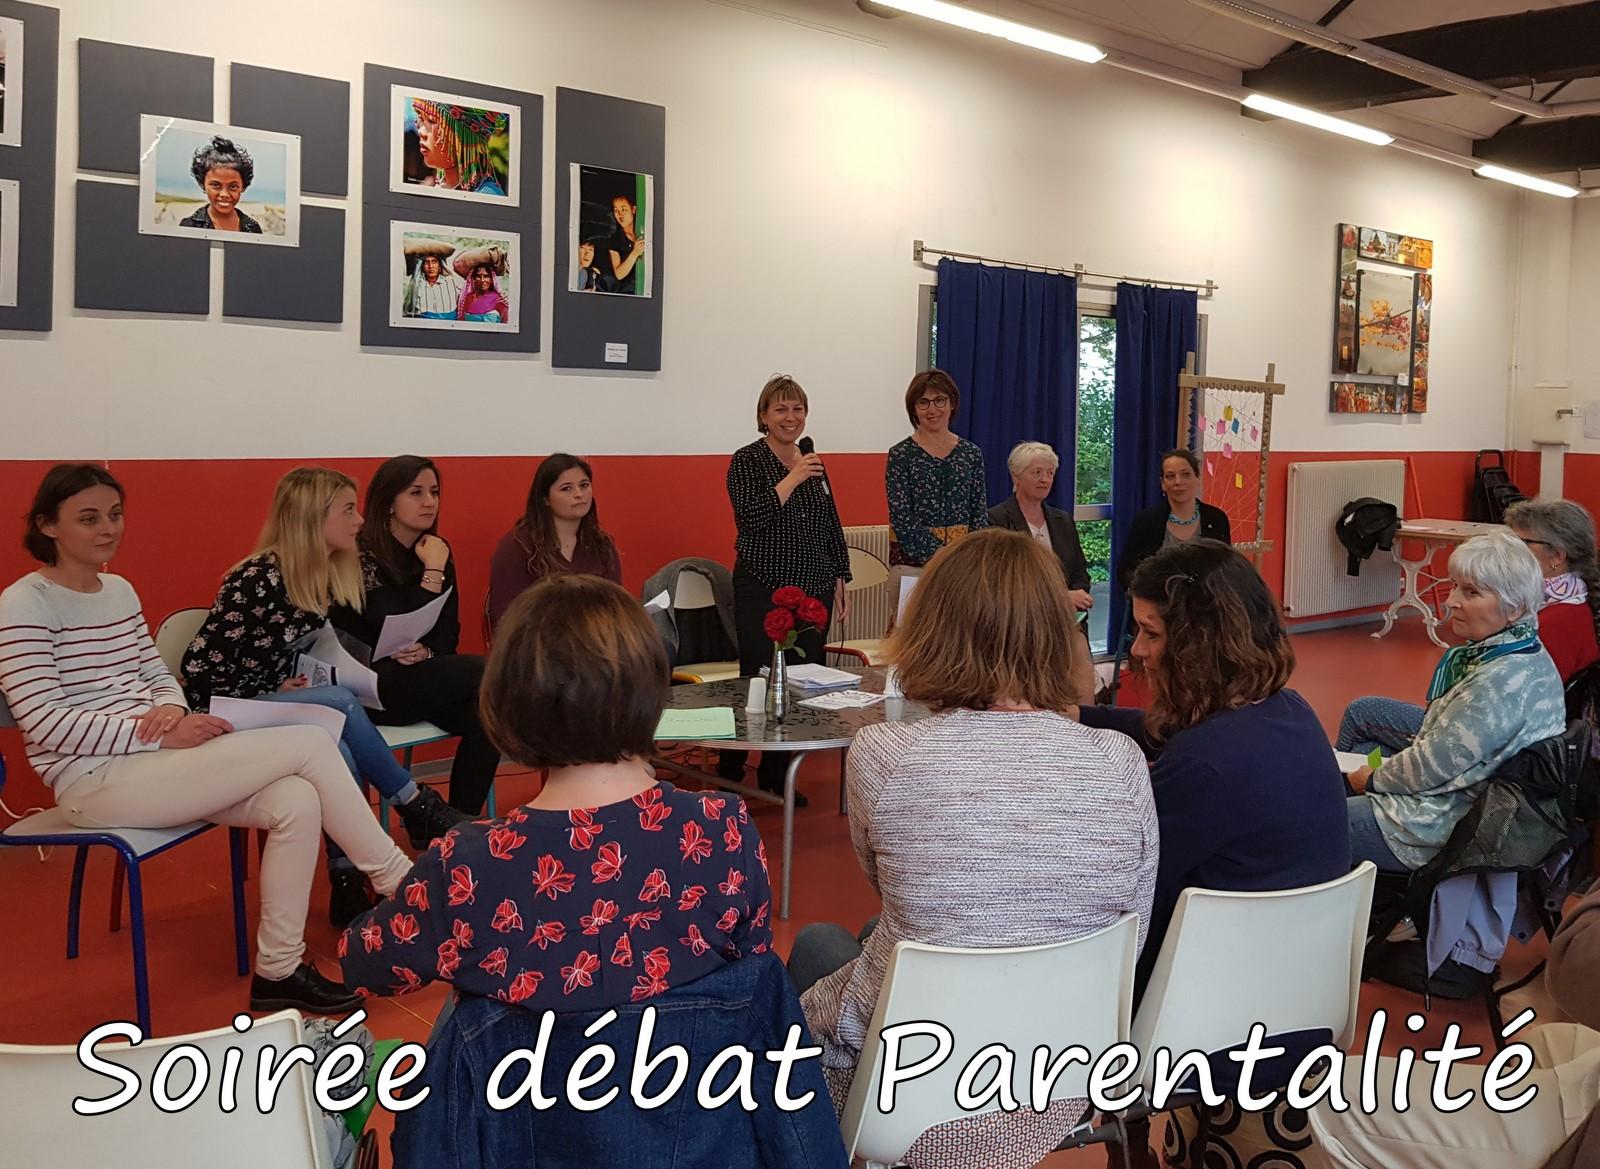 Soiree-debat-Parentalite